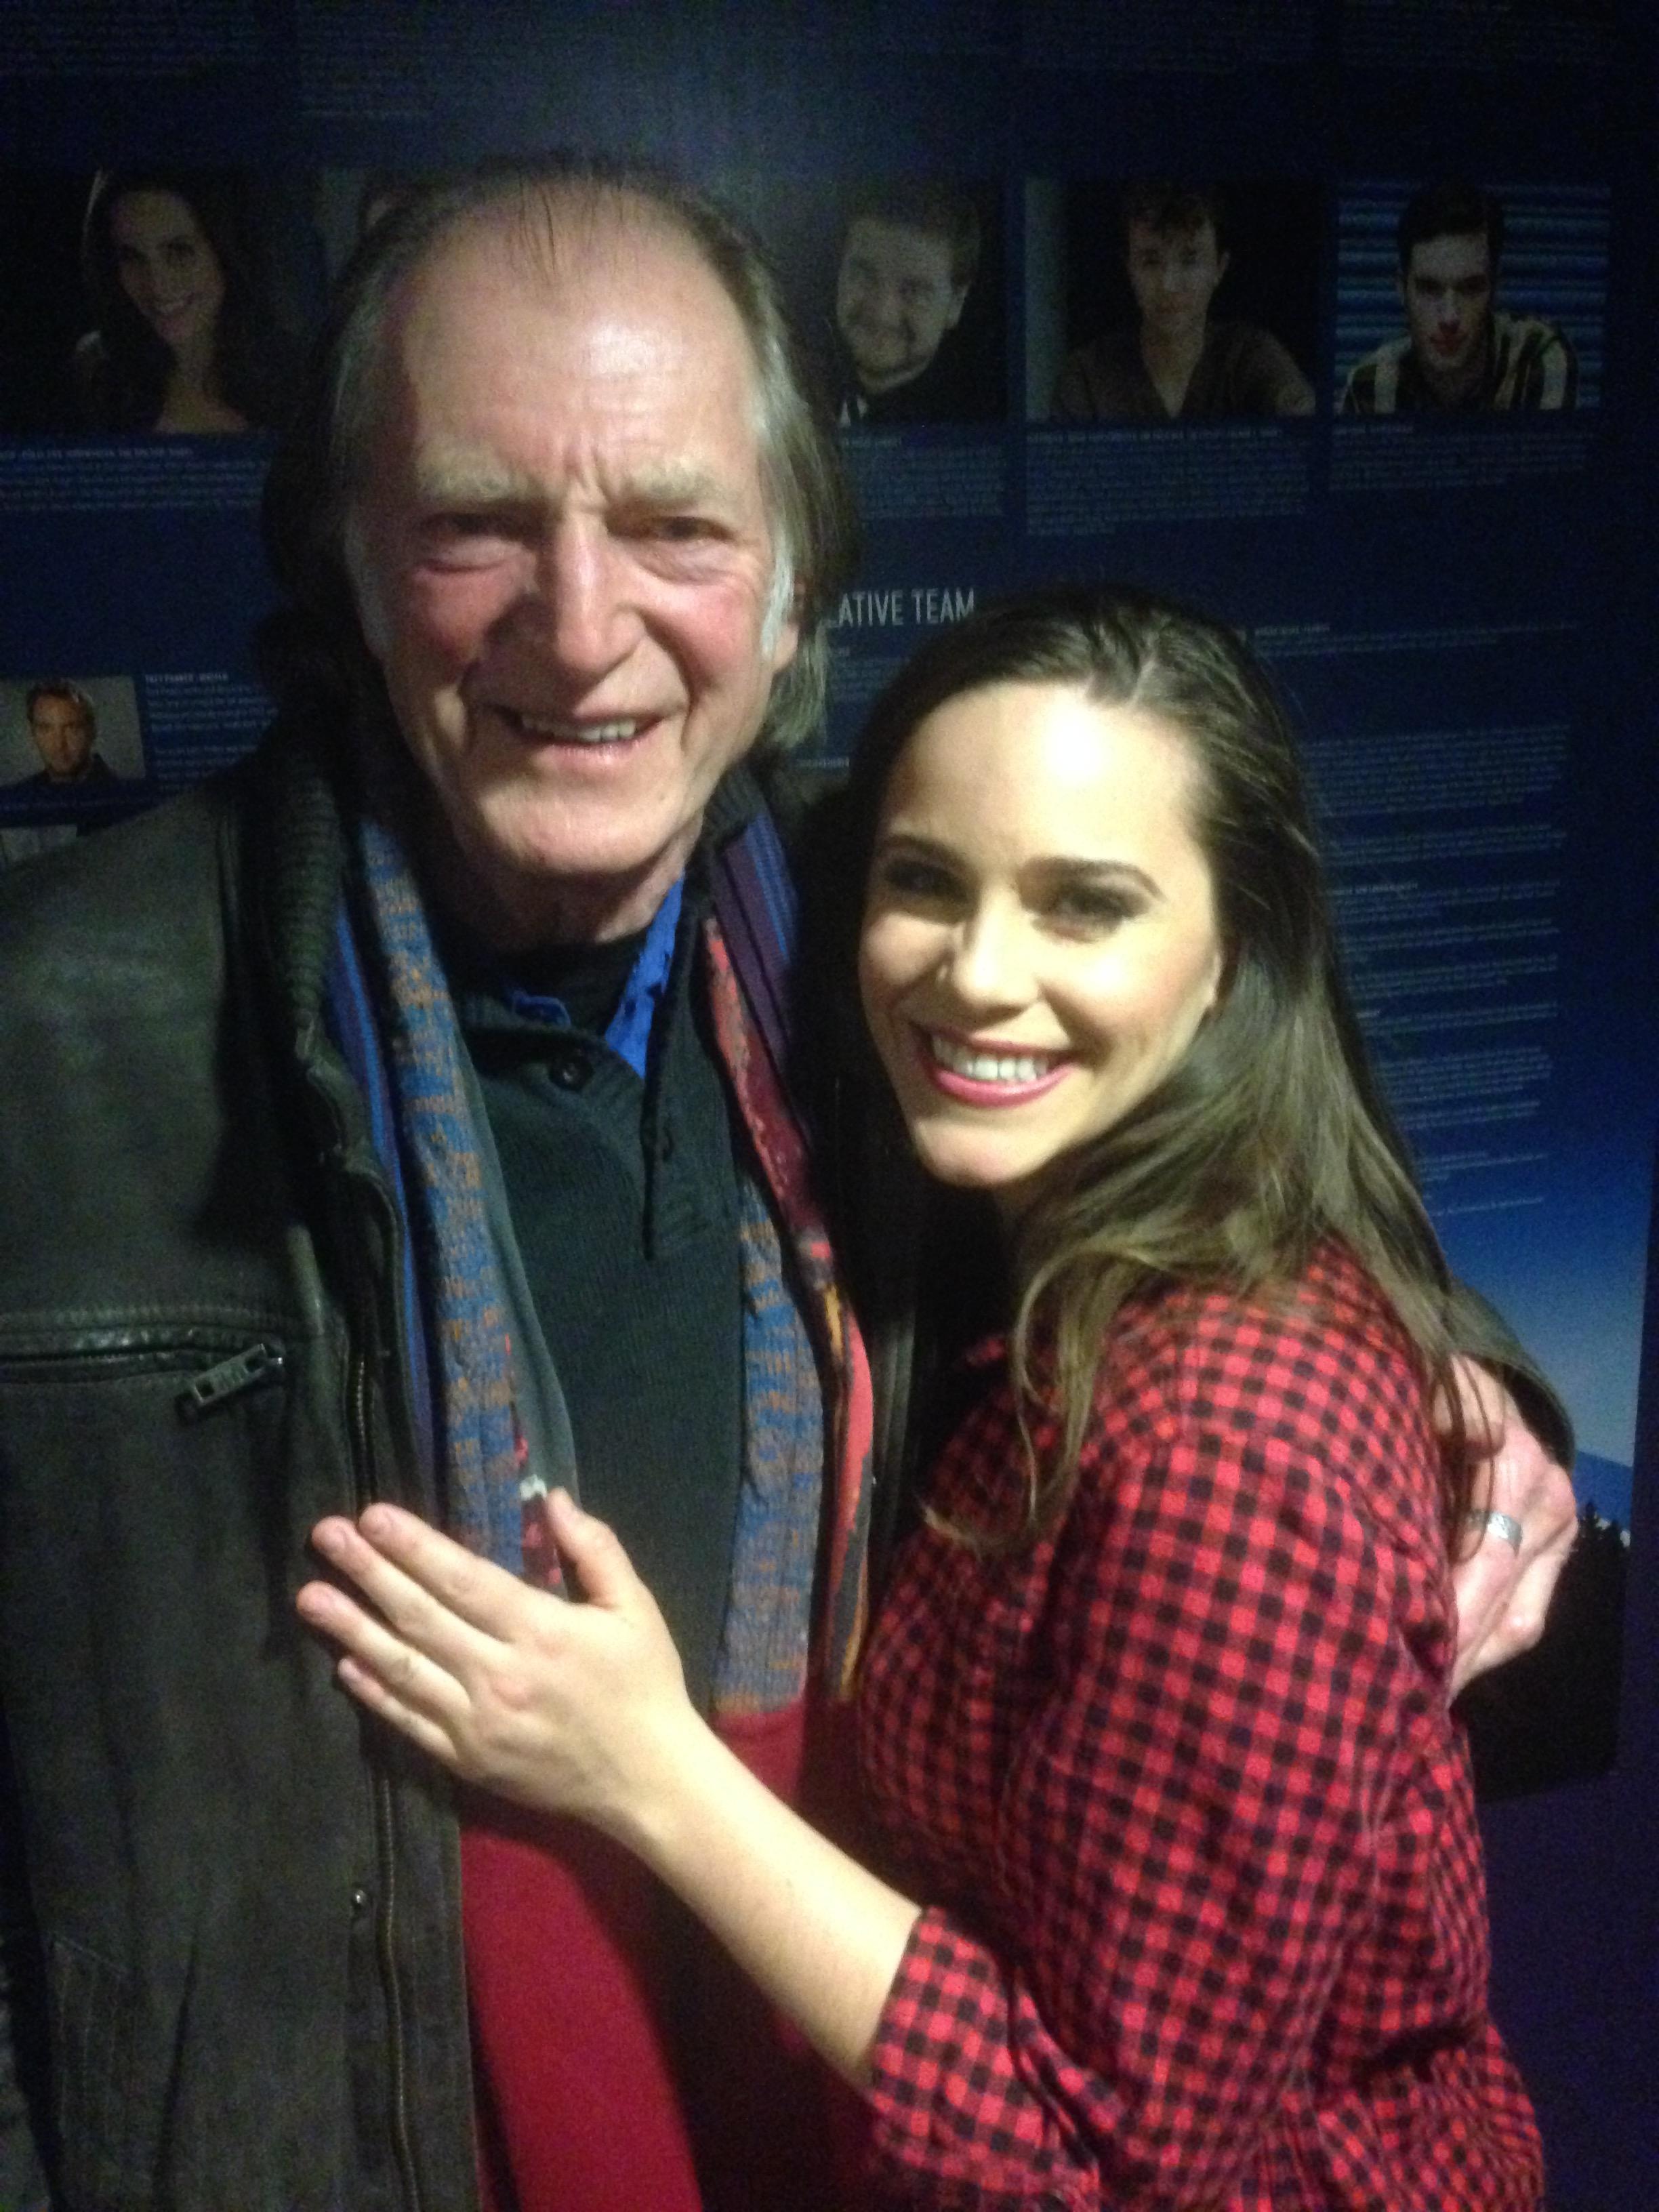 Elicia with David Bradley